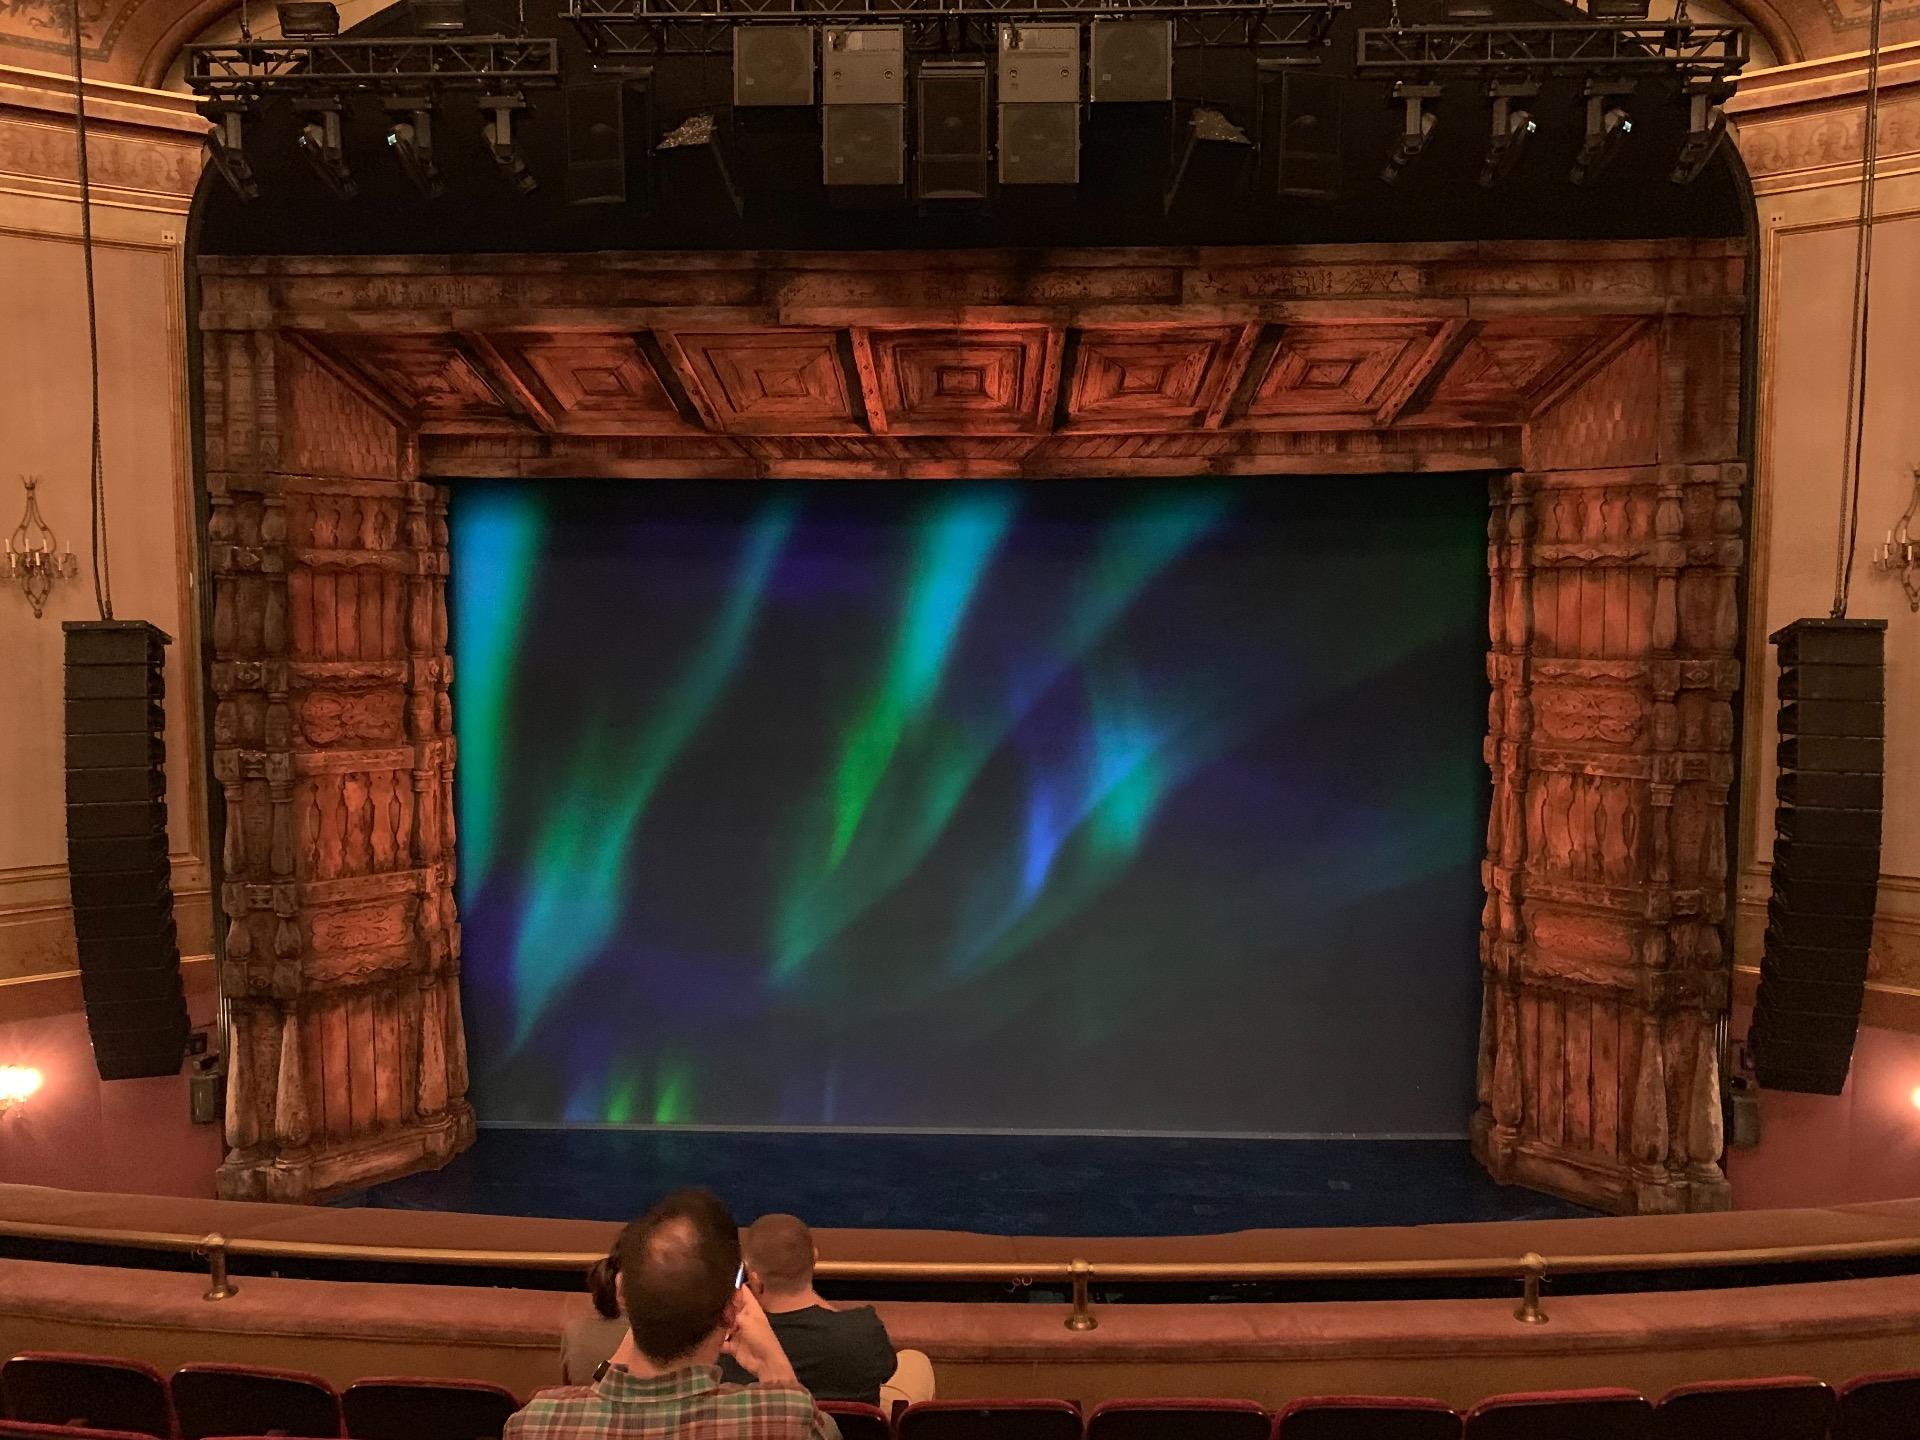 St. James Theatre Section Mezzanine C Row F Seat 107